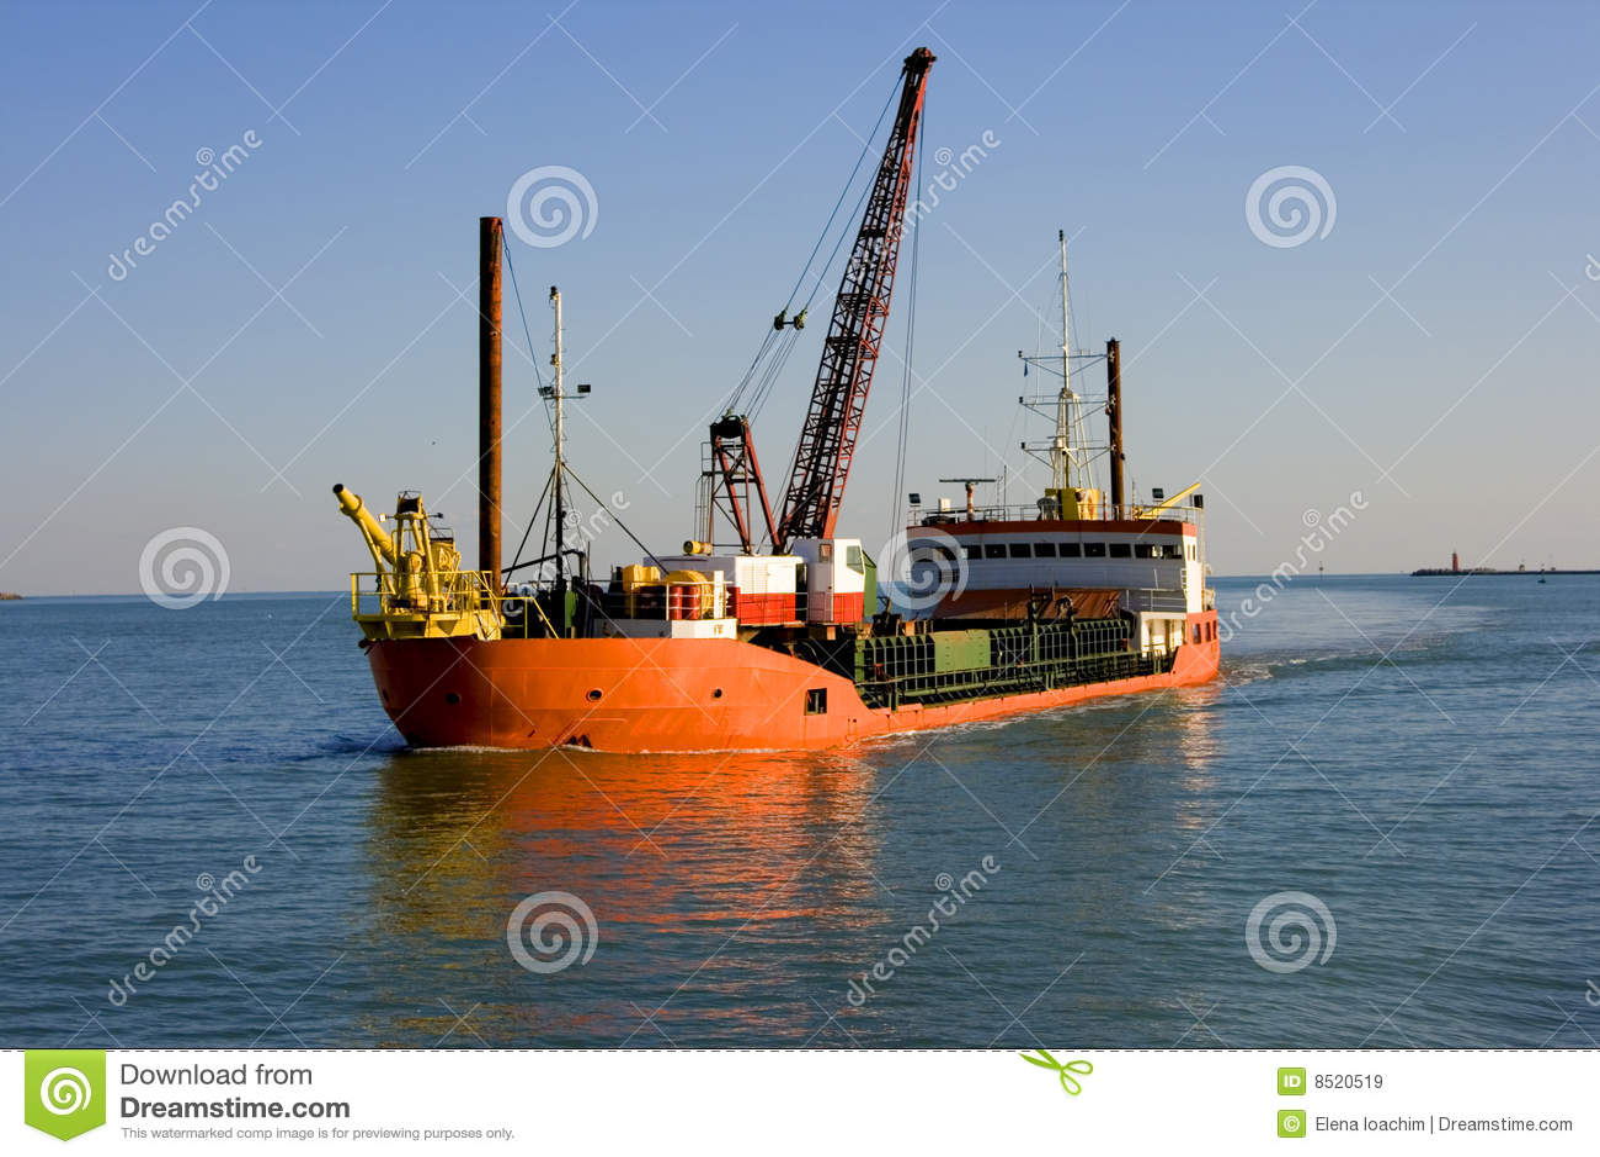 Work ship stock image. Image of drillship, well, crane - 8520519